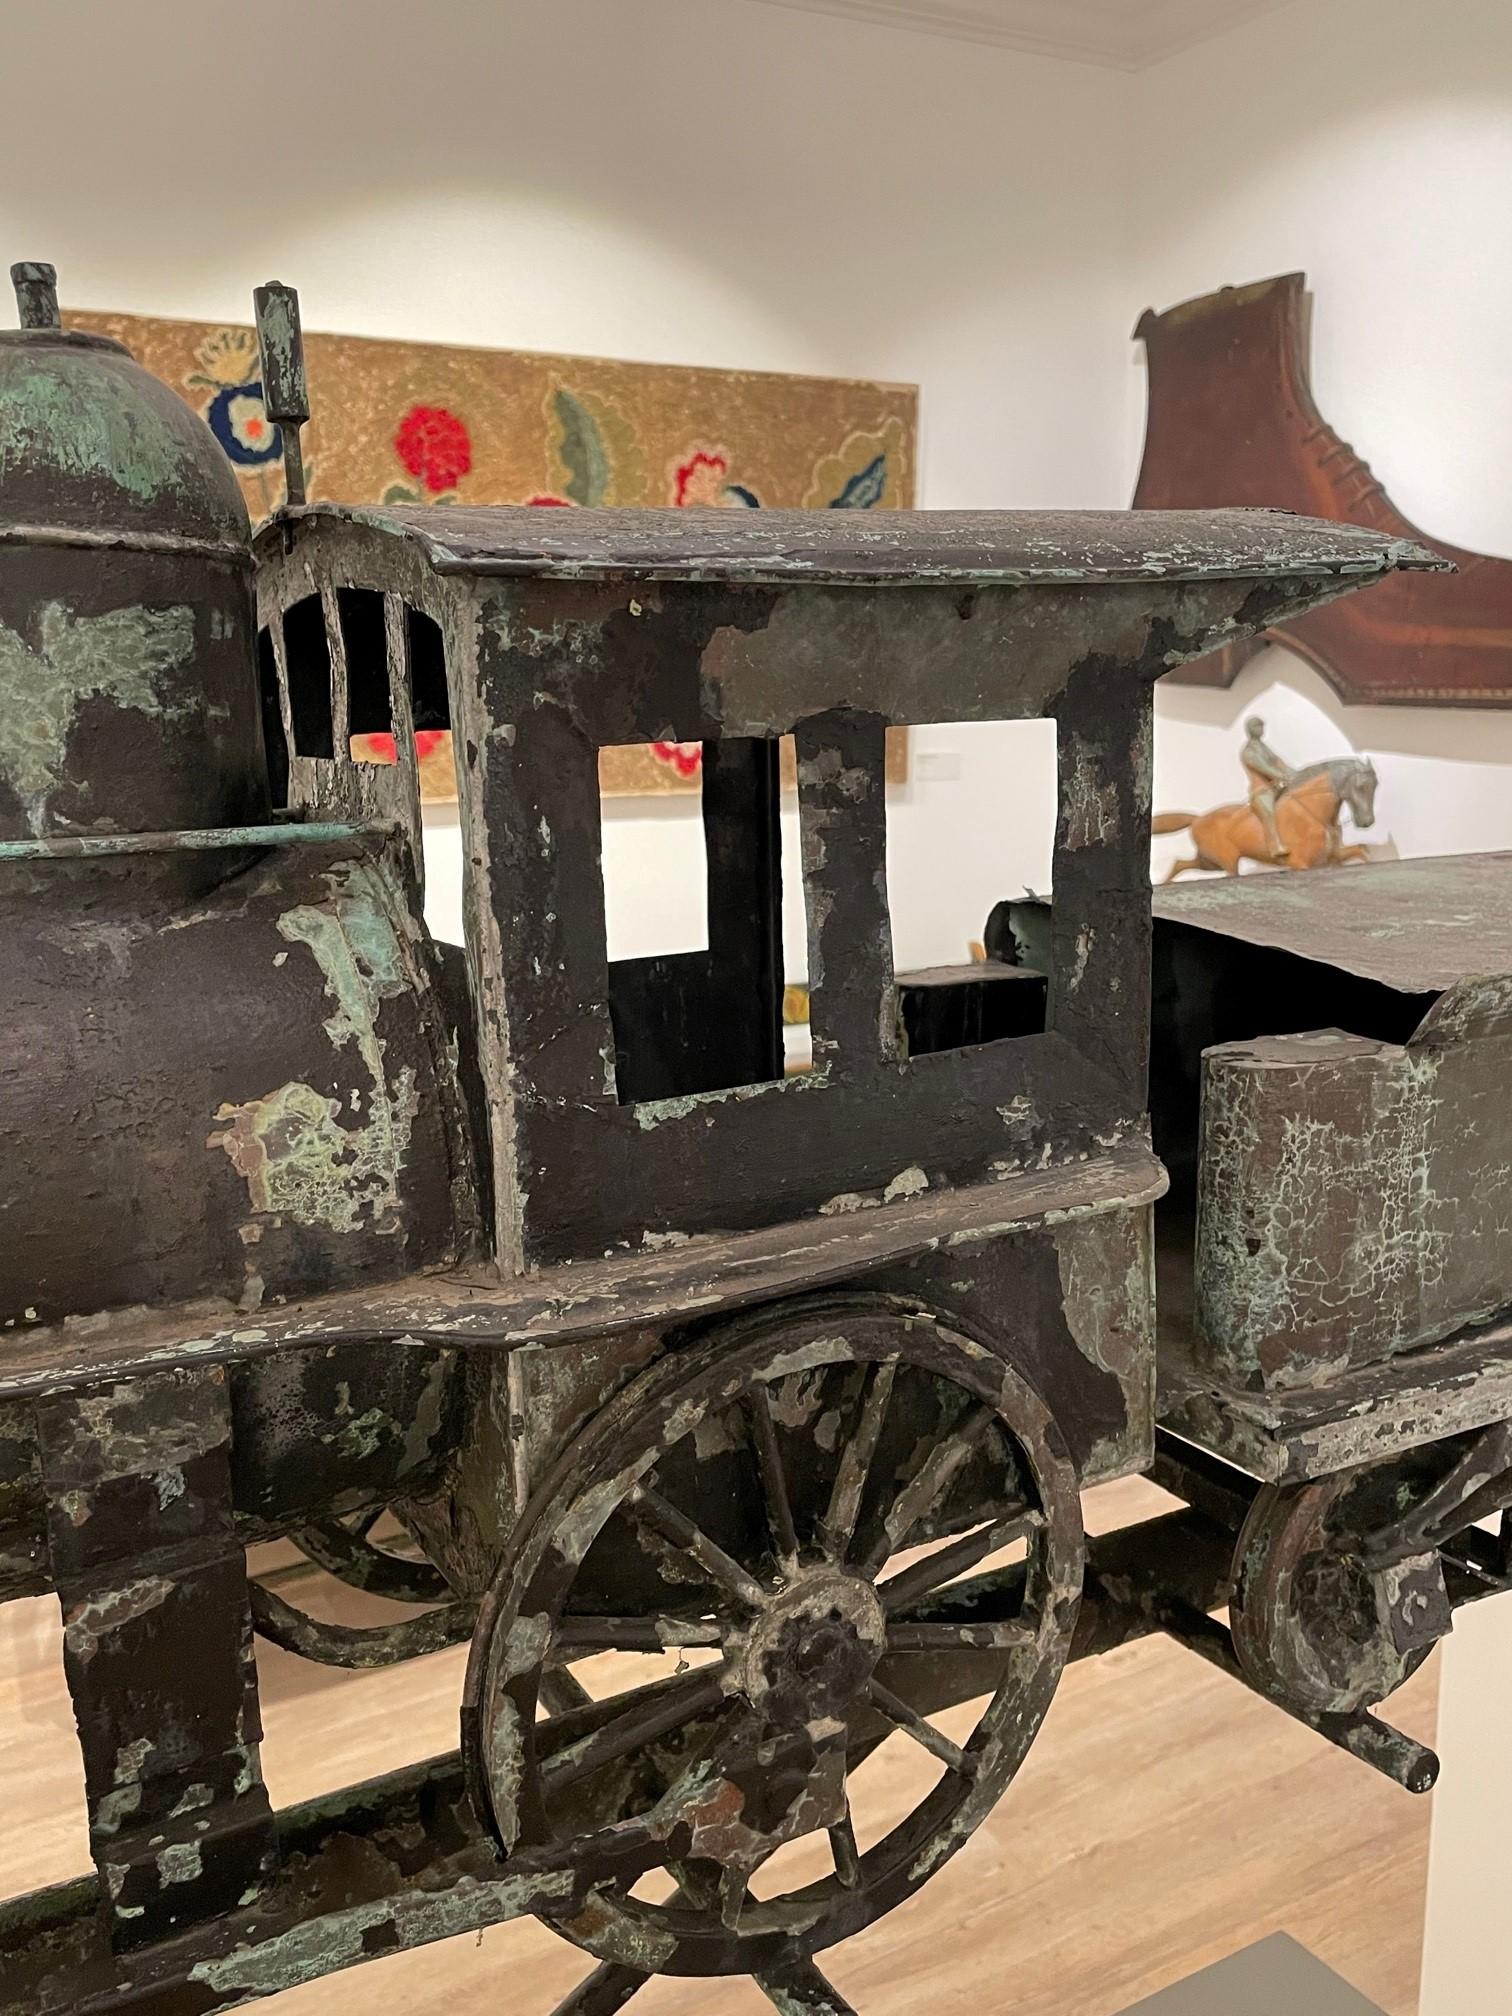 antique train locomotive weathervane rel=